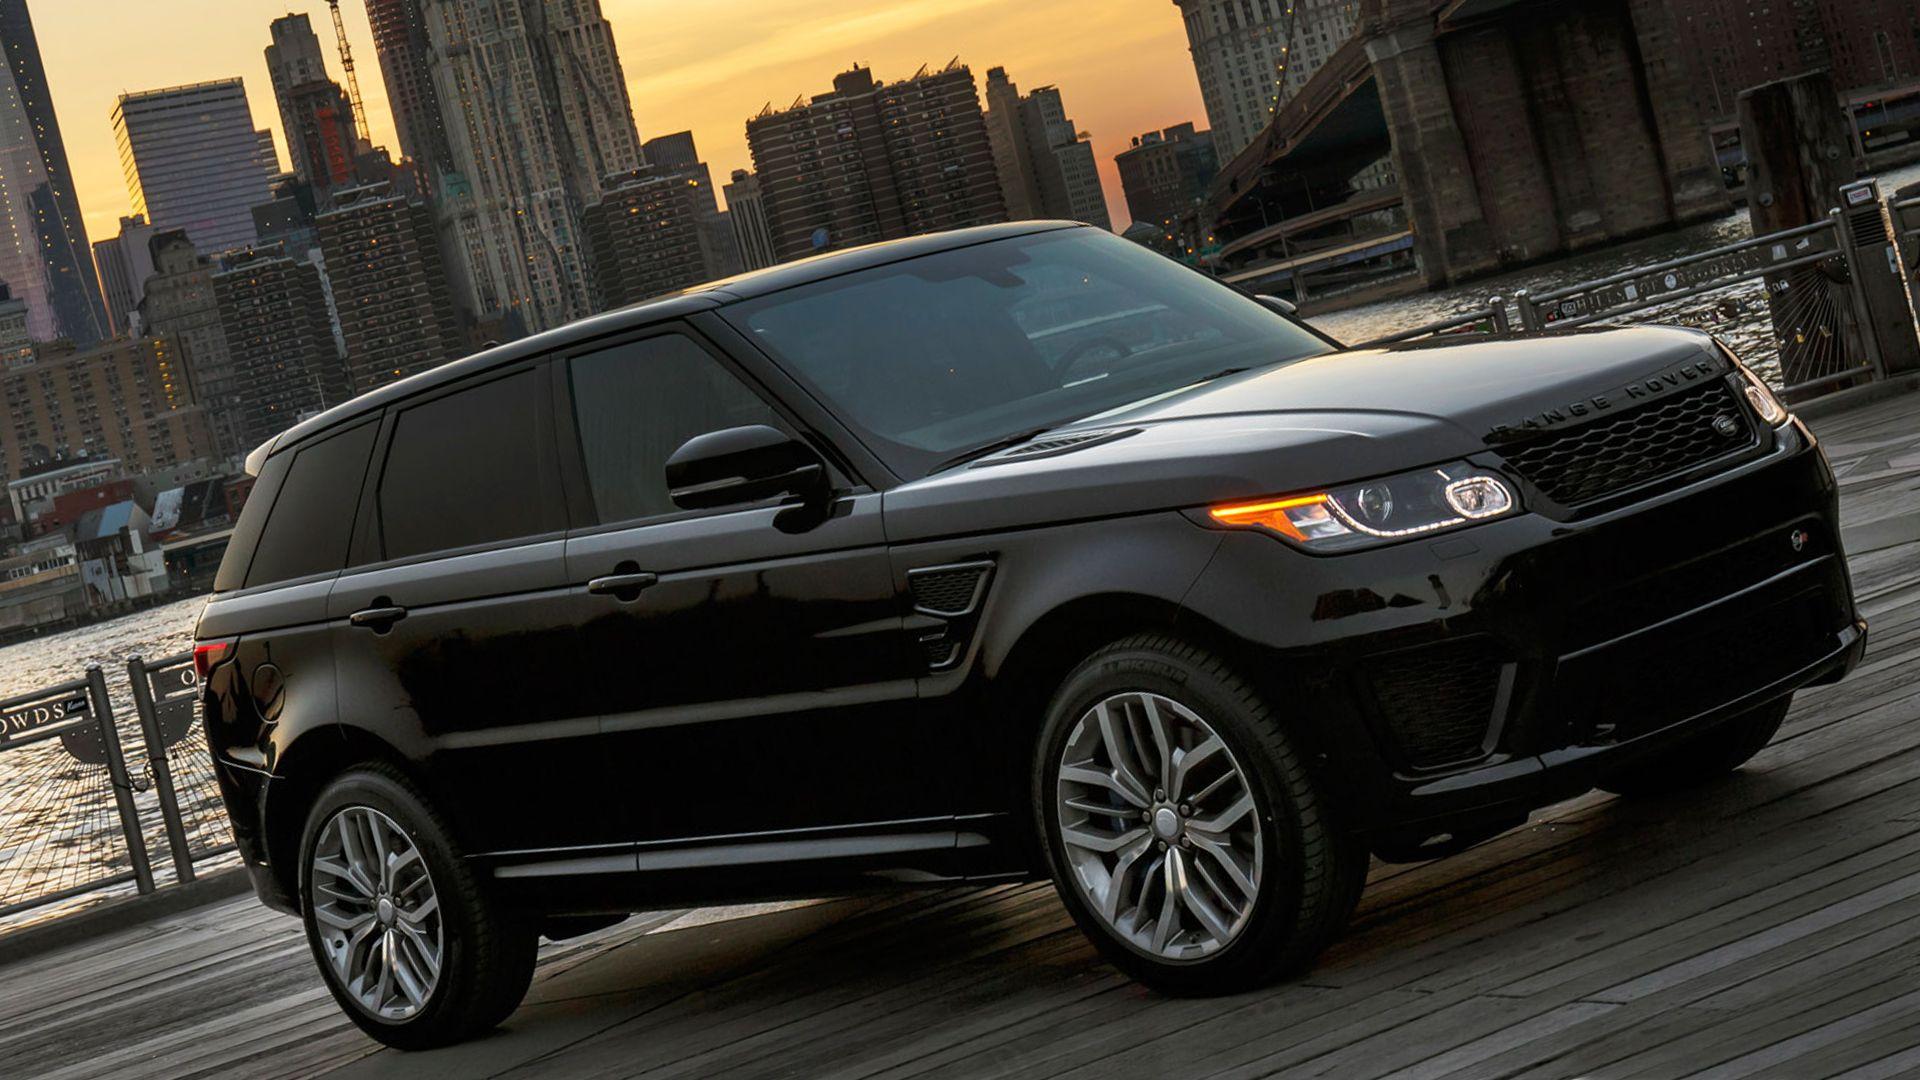 2019 Range Rover Sport Exterior Changes Range Rover Sport Review Range Rover Sport Range Rover Supercharged